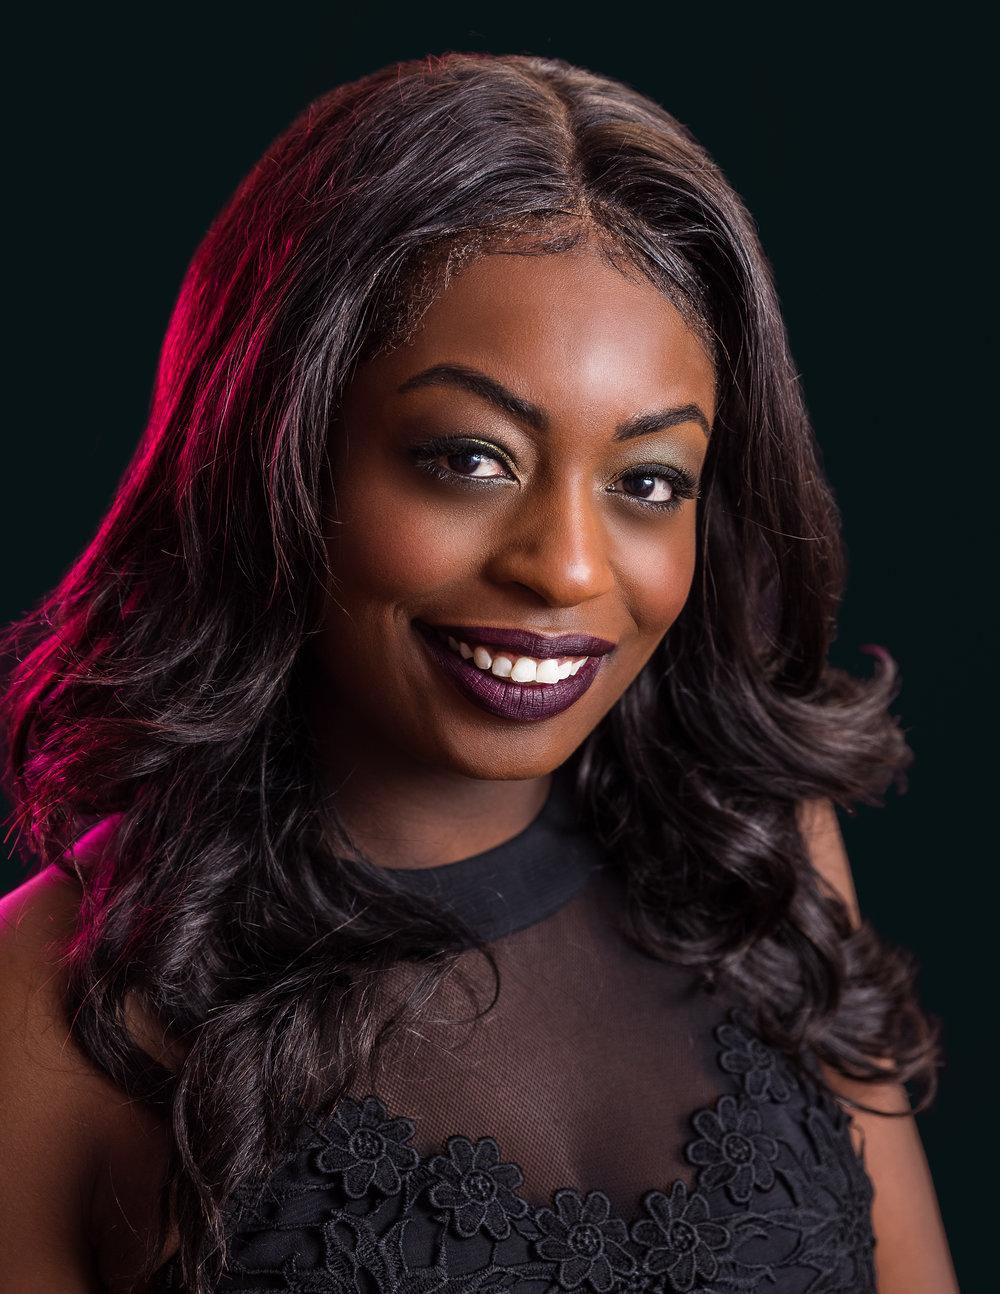 Jameelah Baker